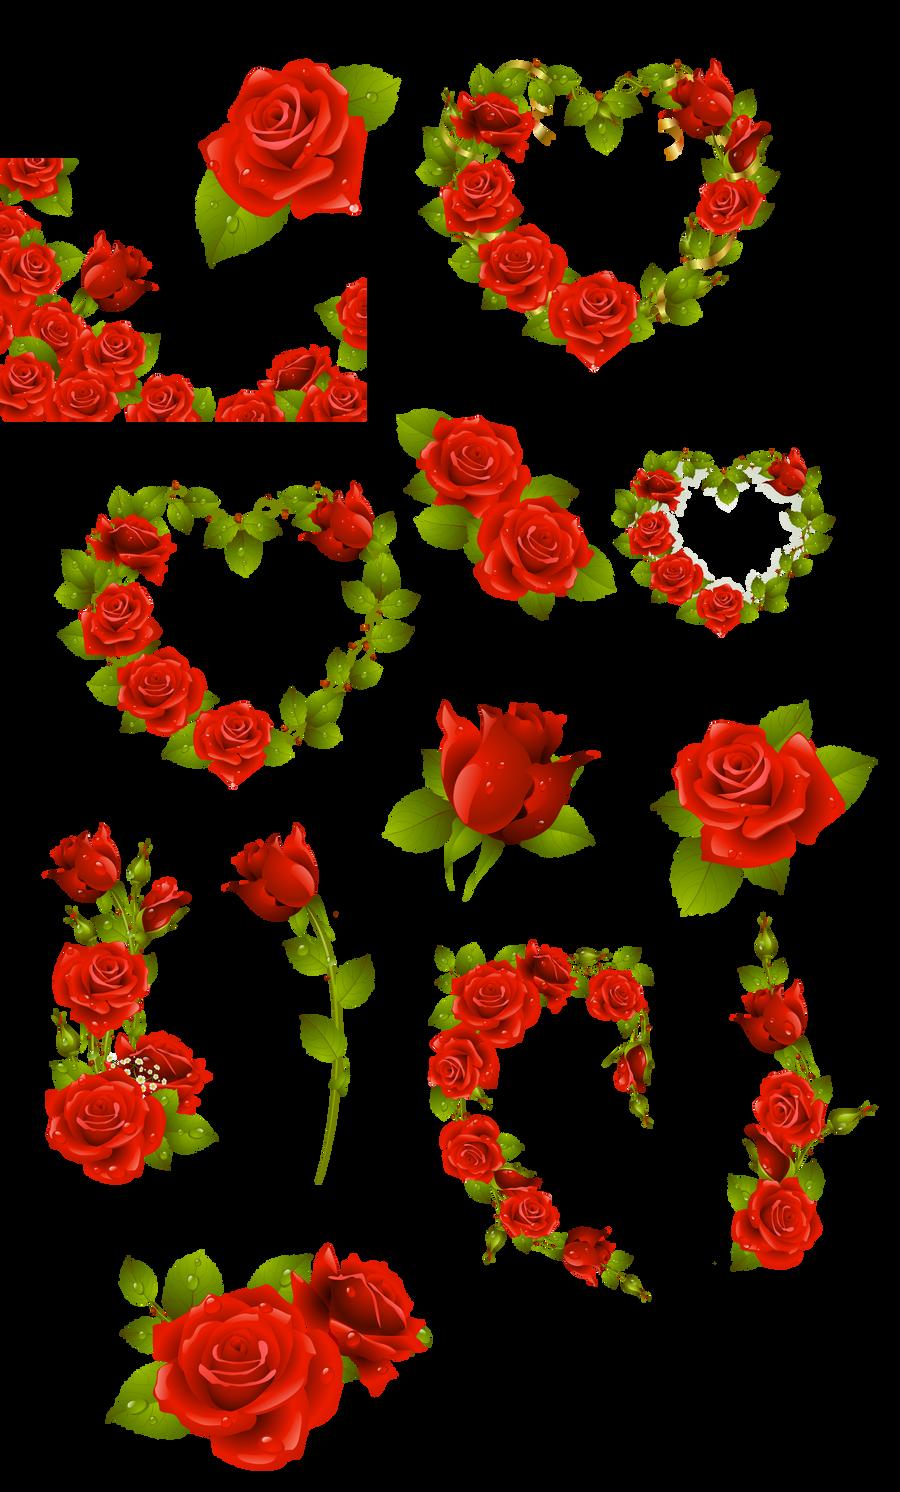 clipart english rose - photo #13